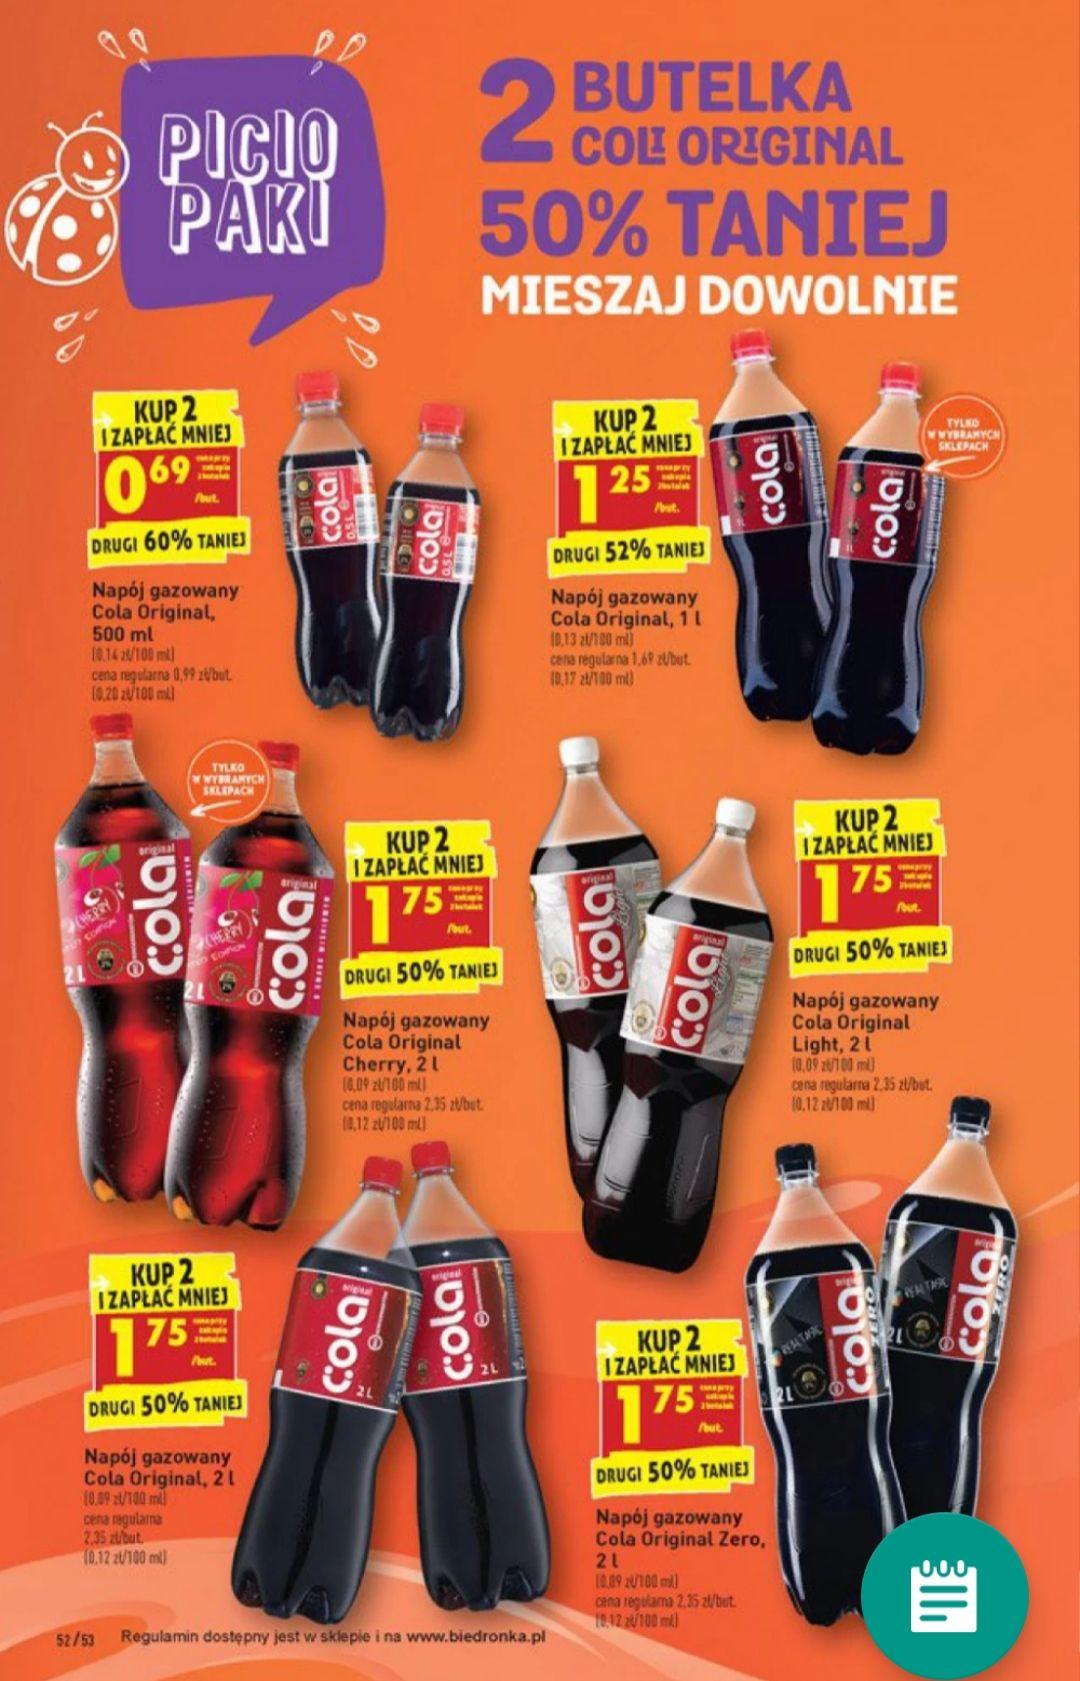 Druga butelka Cola Original 50% taniej - Biedronka